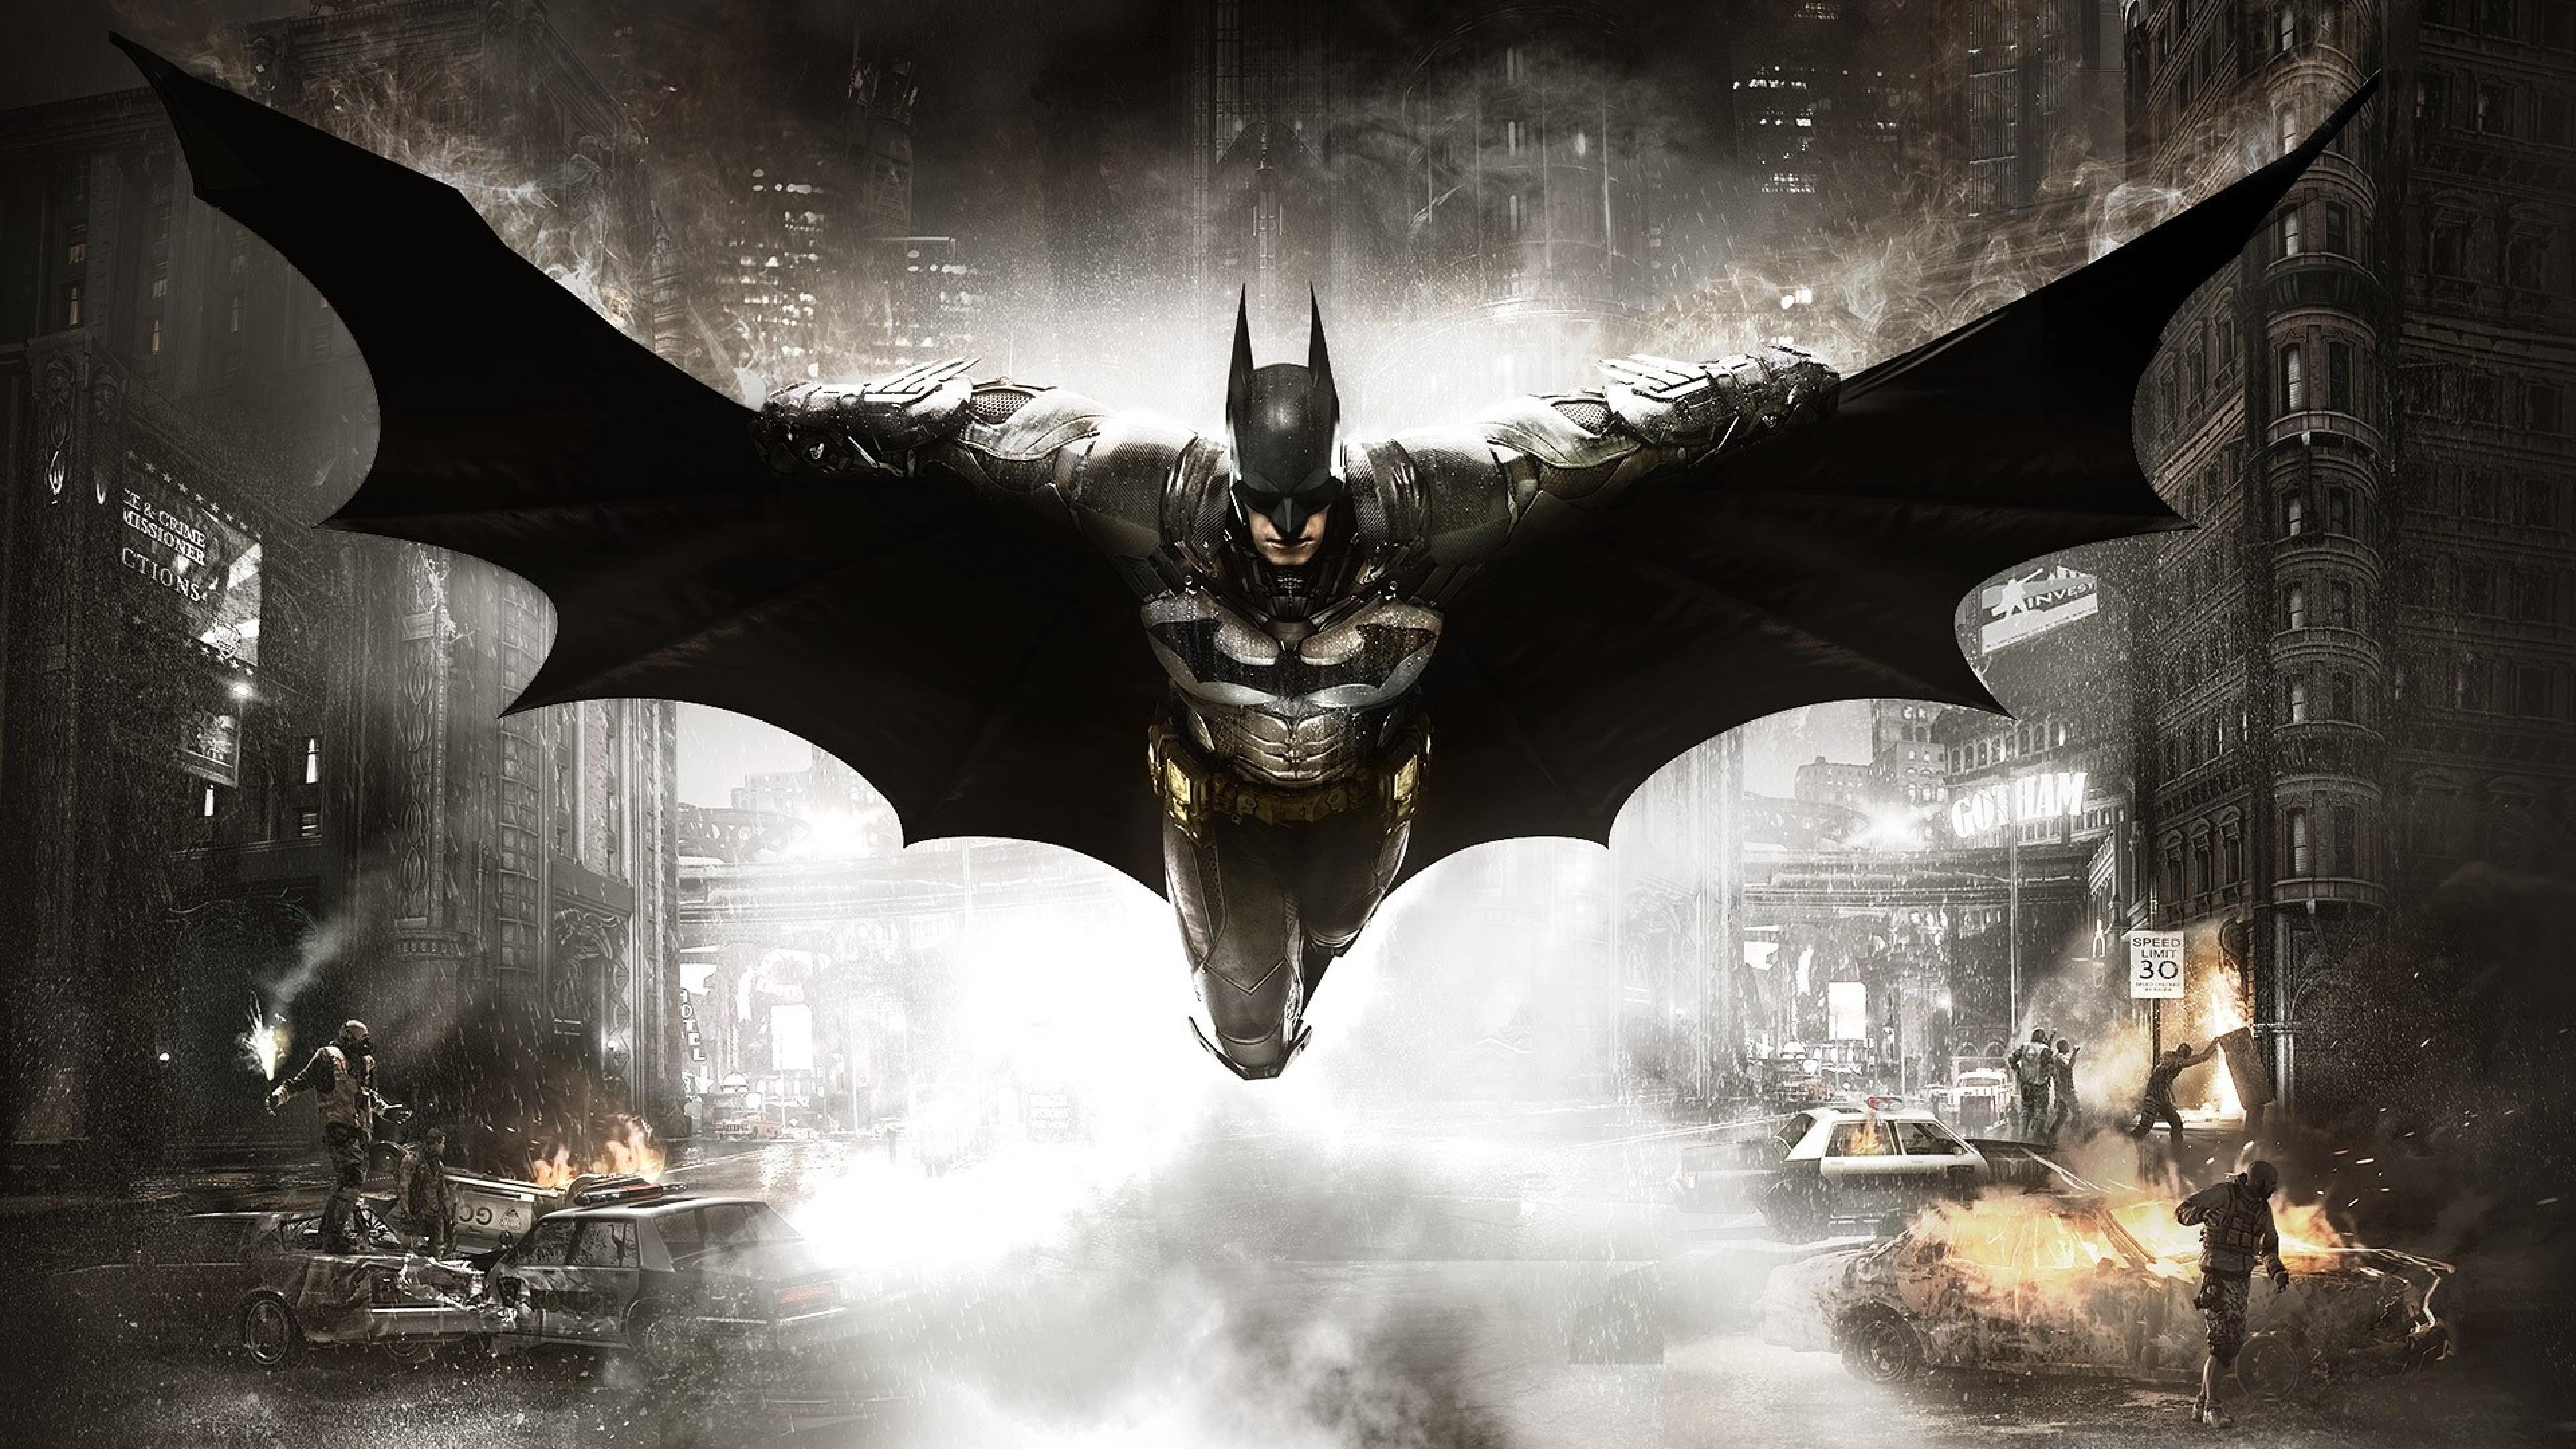 800x1280 Batman Arkham Knight 2 Nexus 7,Samsung Galaxy Tab ...